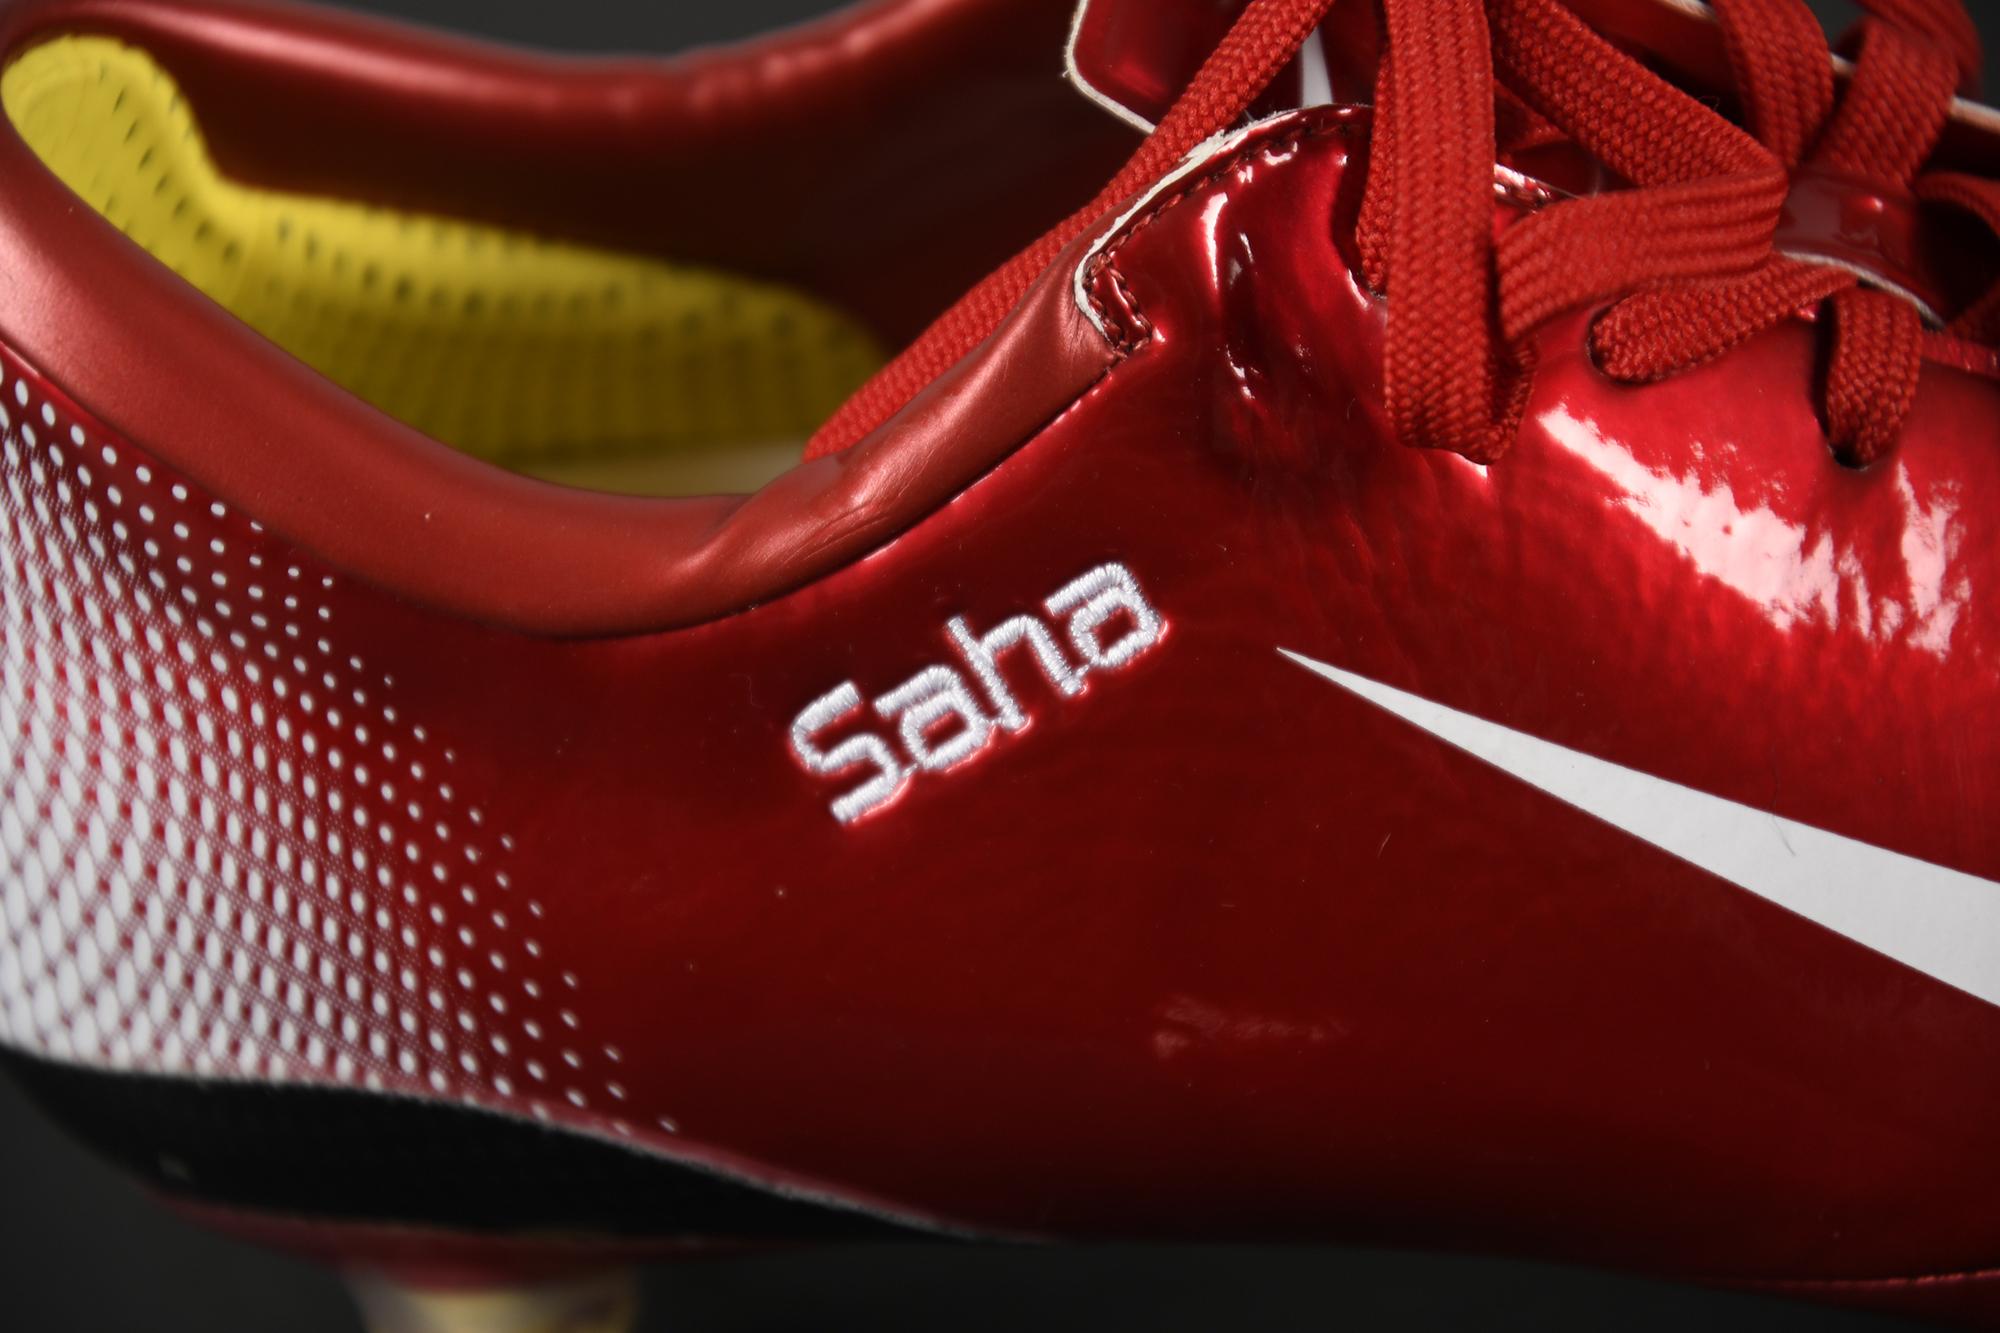 LOUIS SAHA Personalised Football Boots - Image 4 of 5